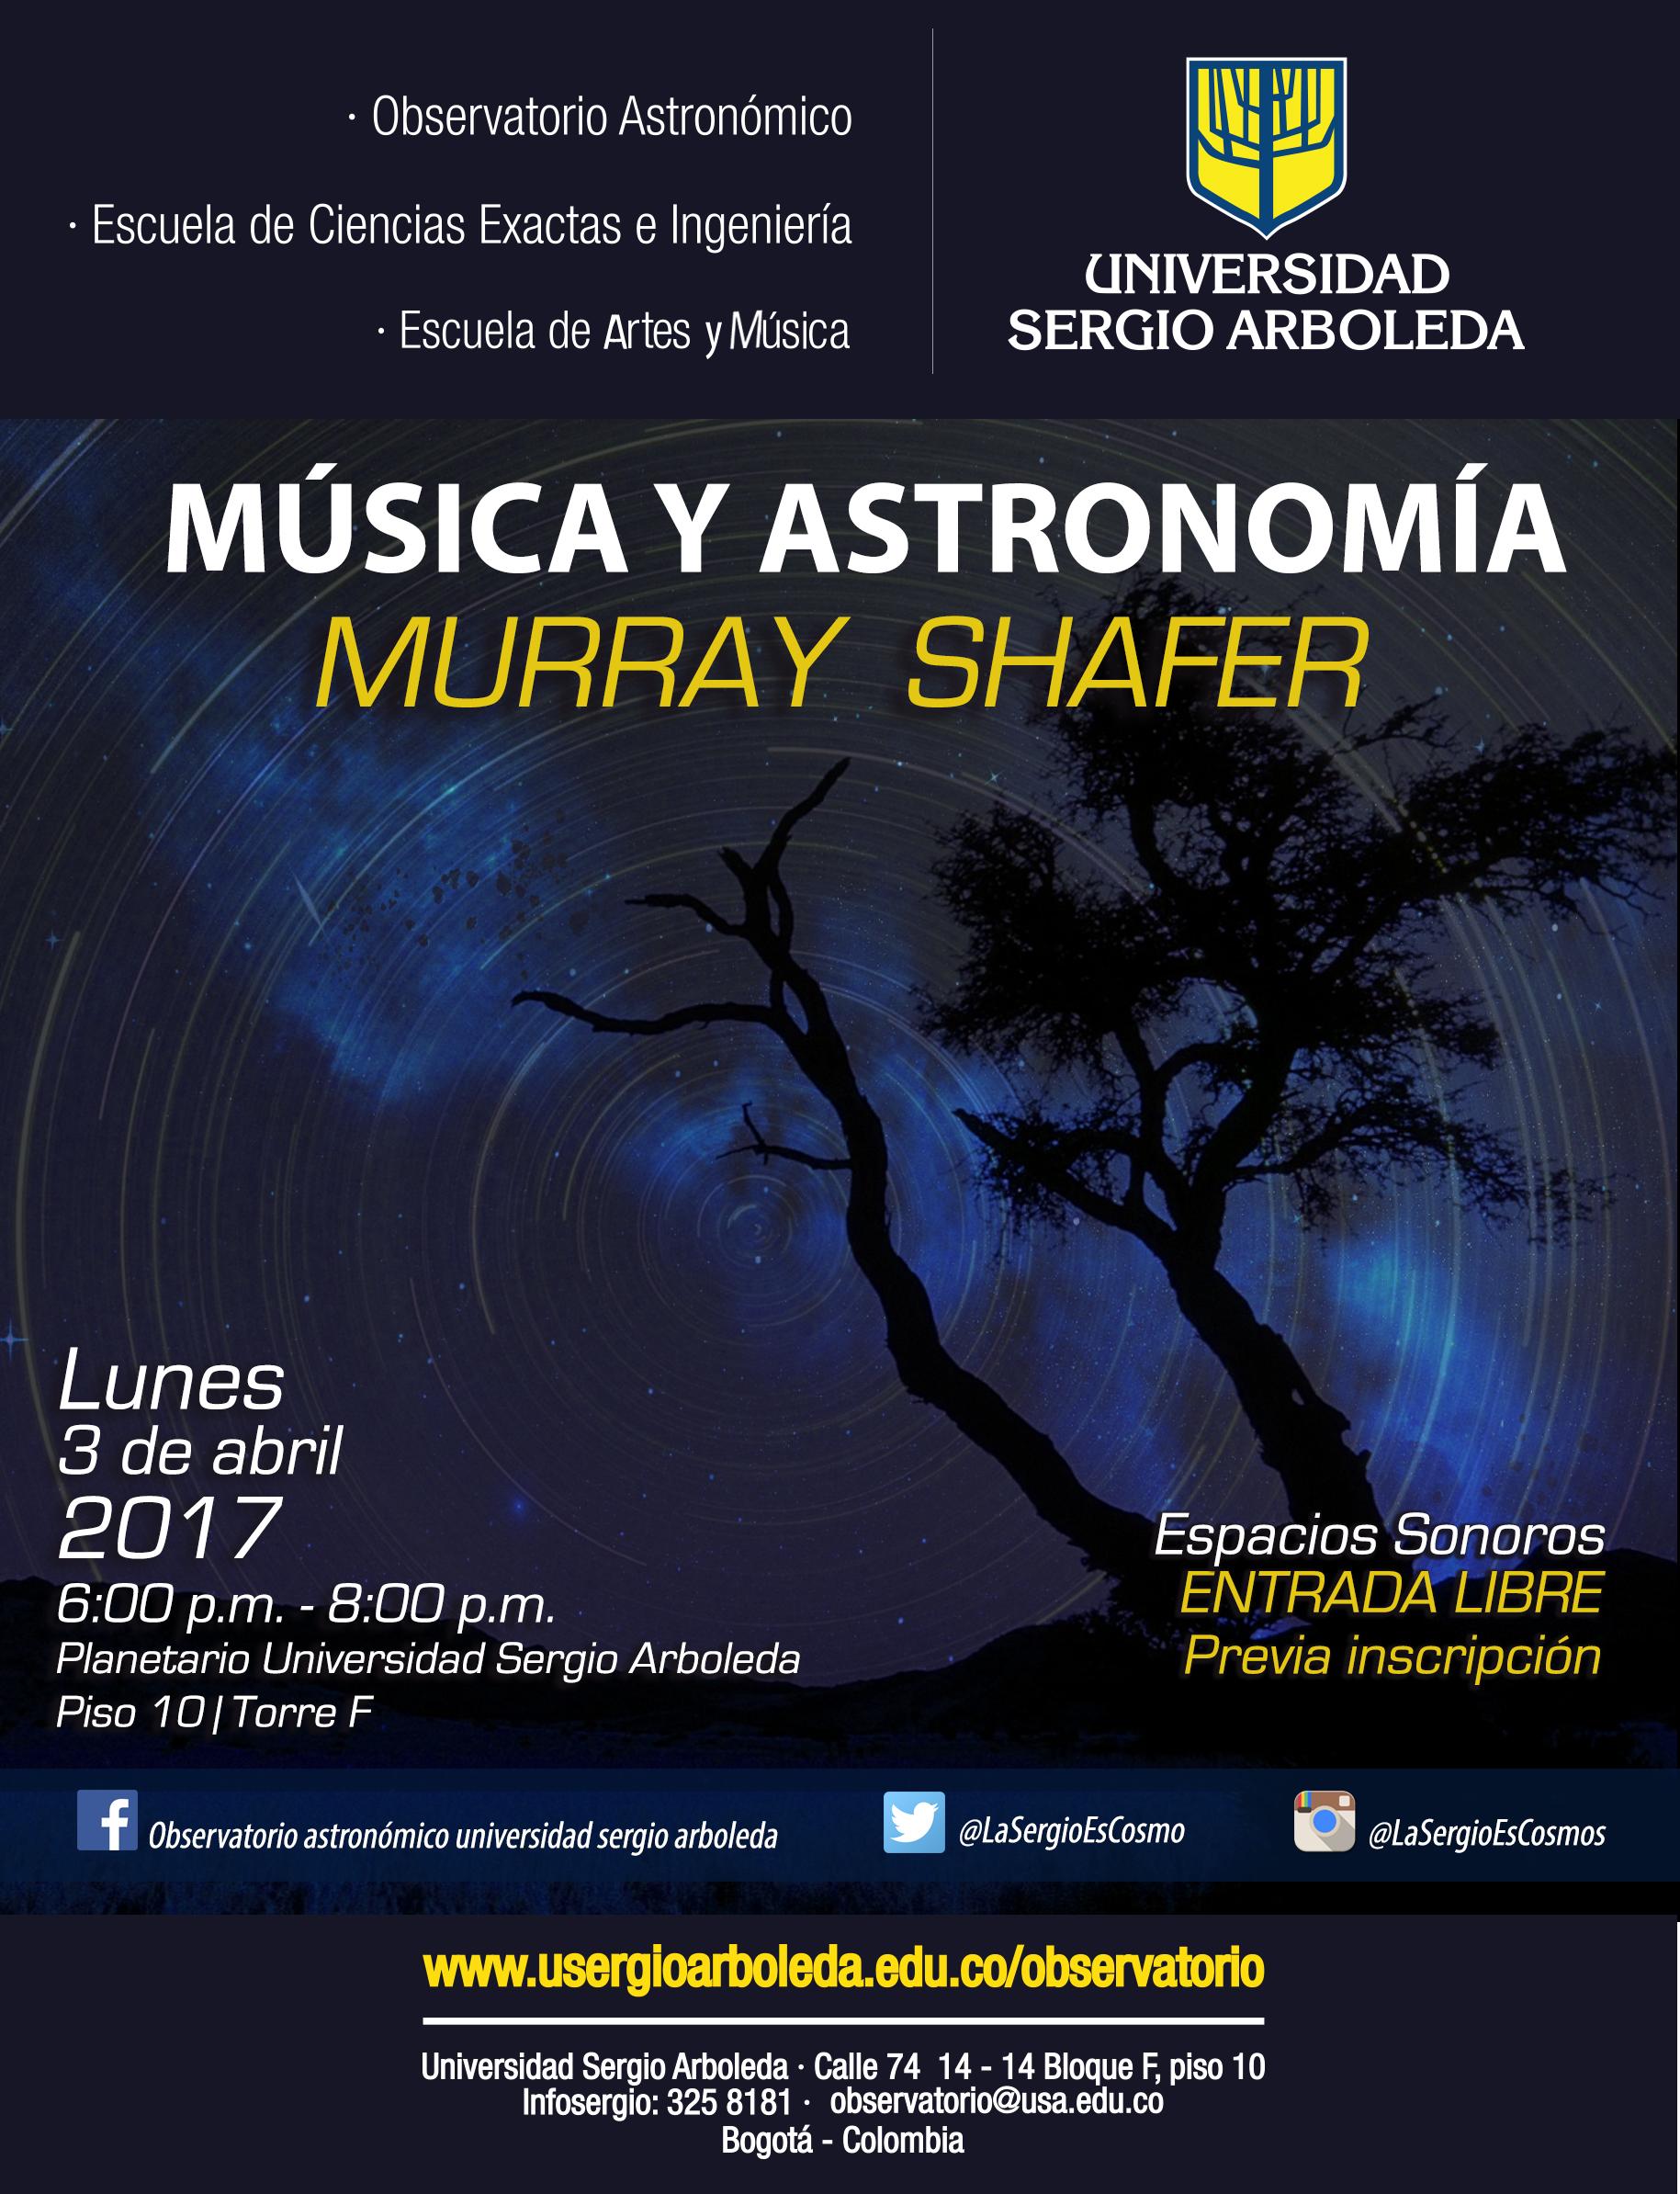 Musica_y_astronomia_murray_shaffer